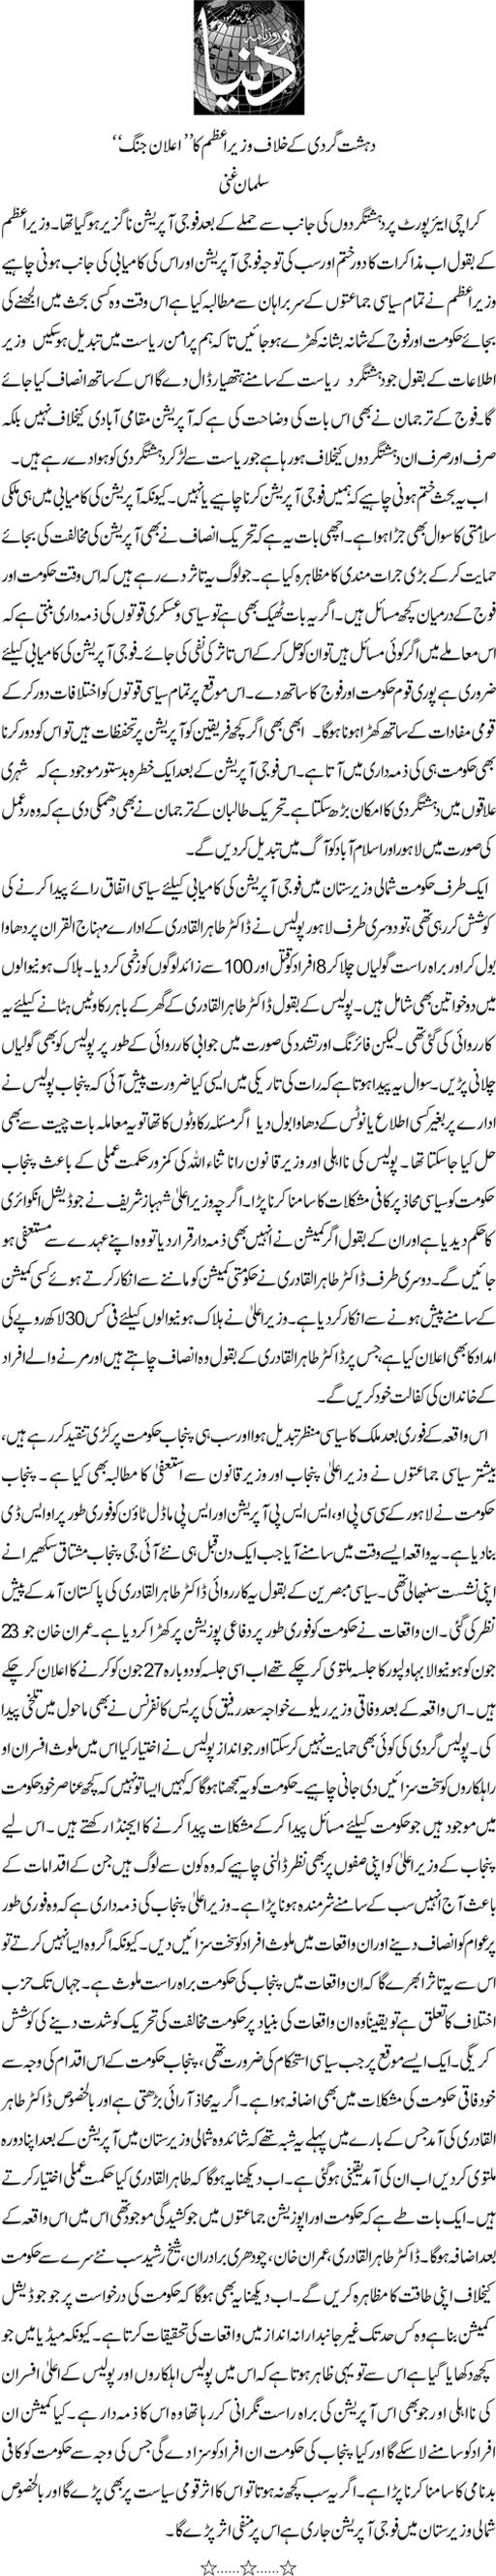 Print Media Coverage Daily Dunya Page: 16